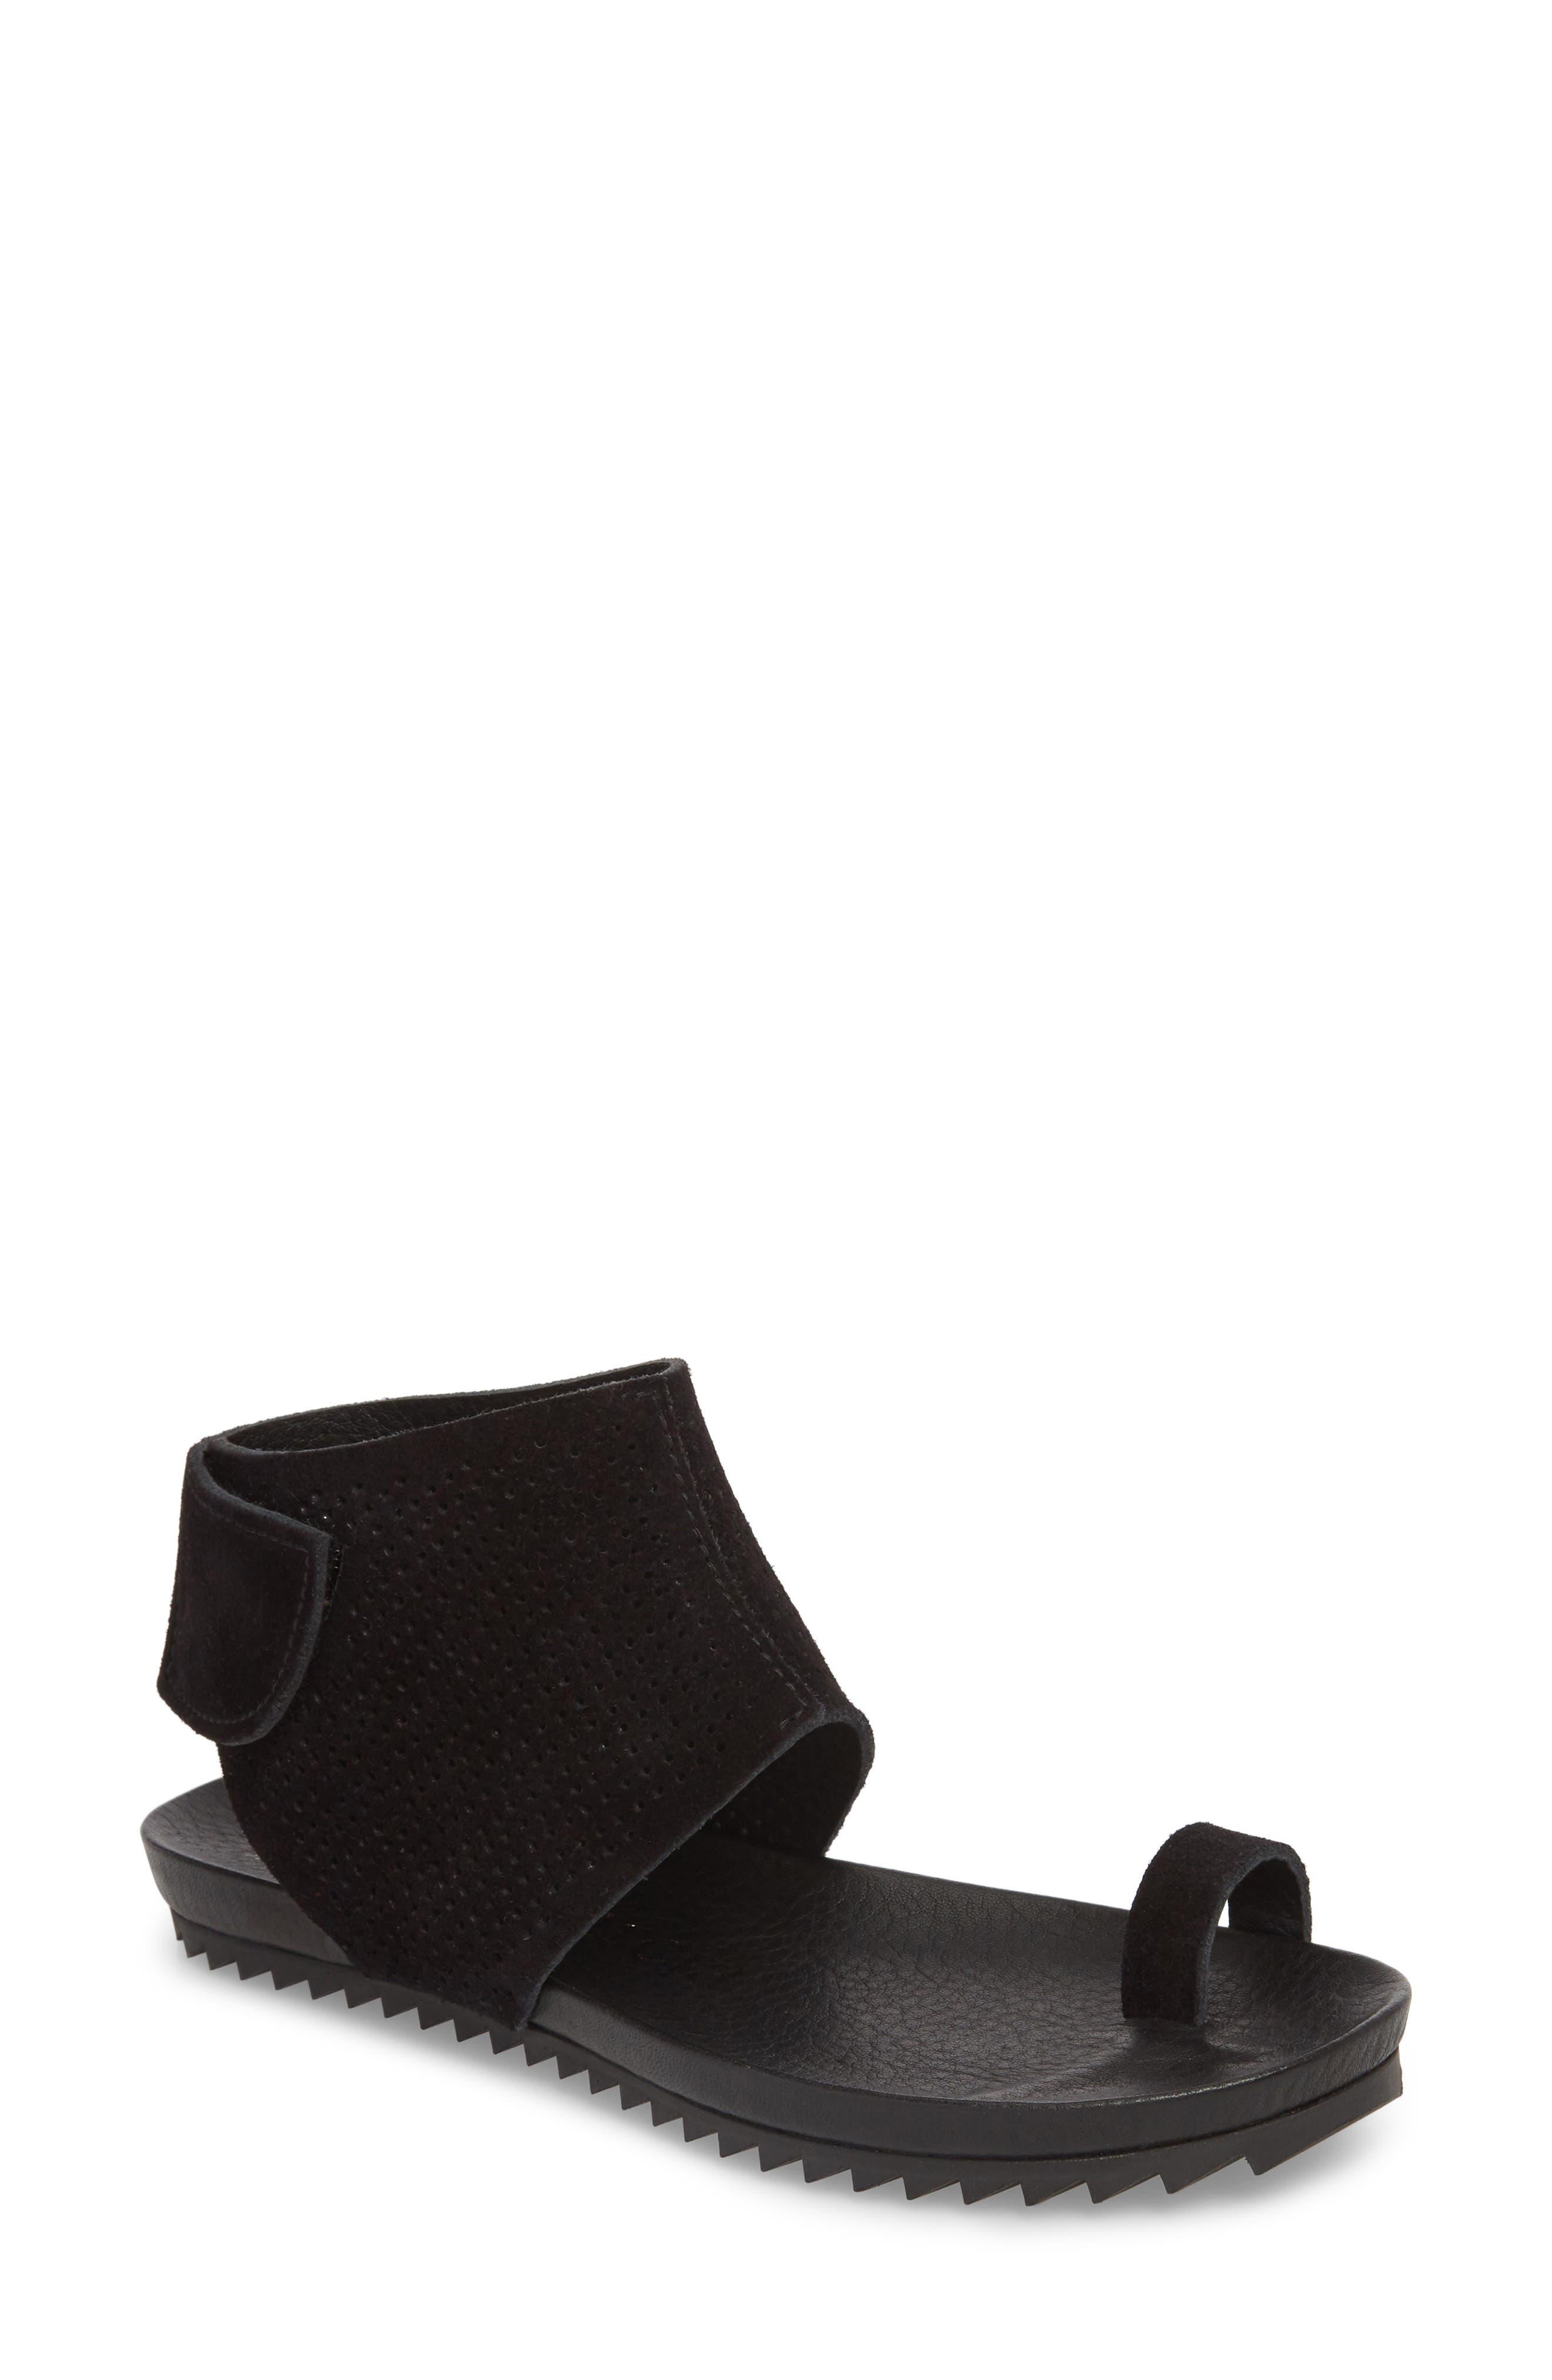 Pedro Garcia Verena Ankle Cuff Sandal (Women) (Nordstrom Exclusive)